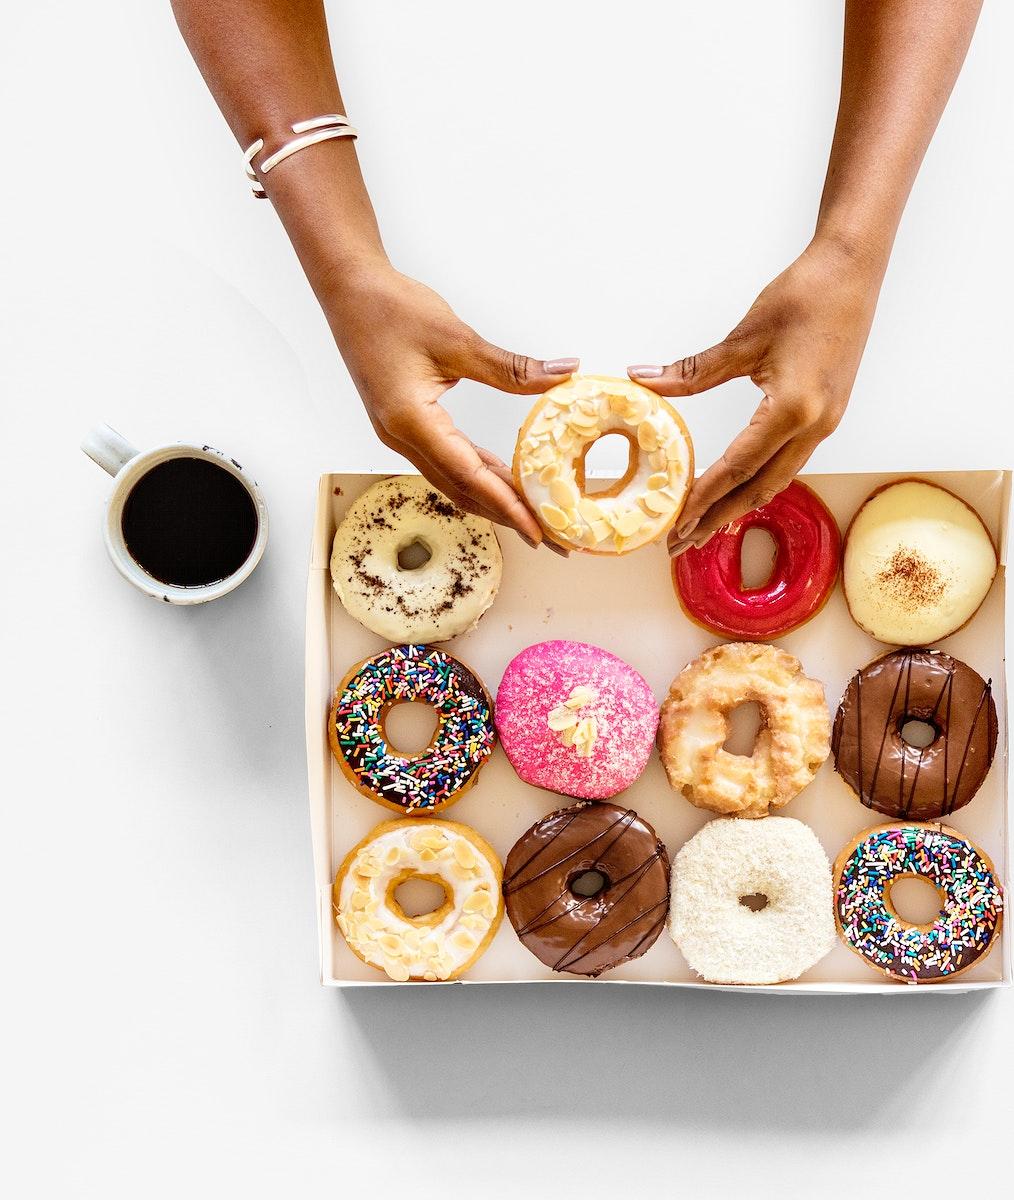 Hands holding sweeten donut dessert in aerial view